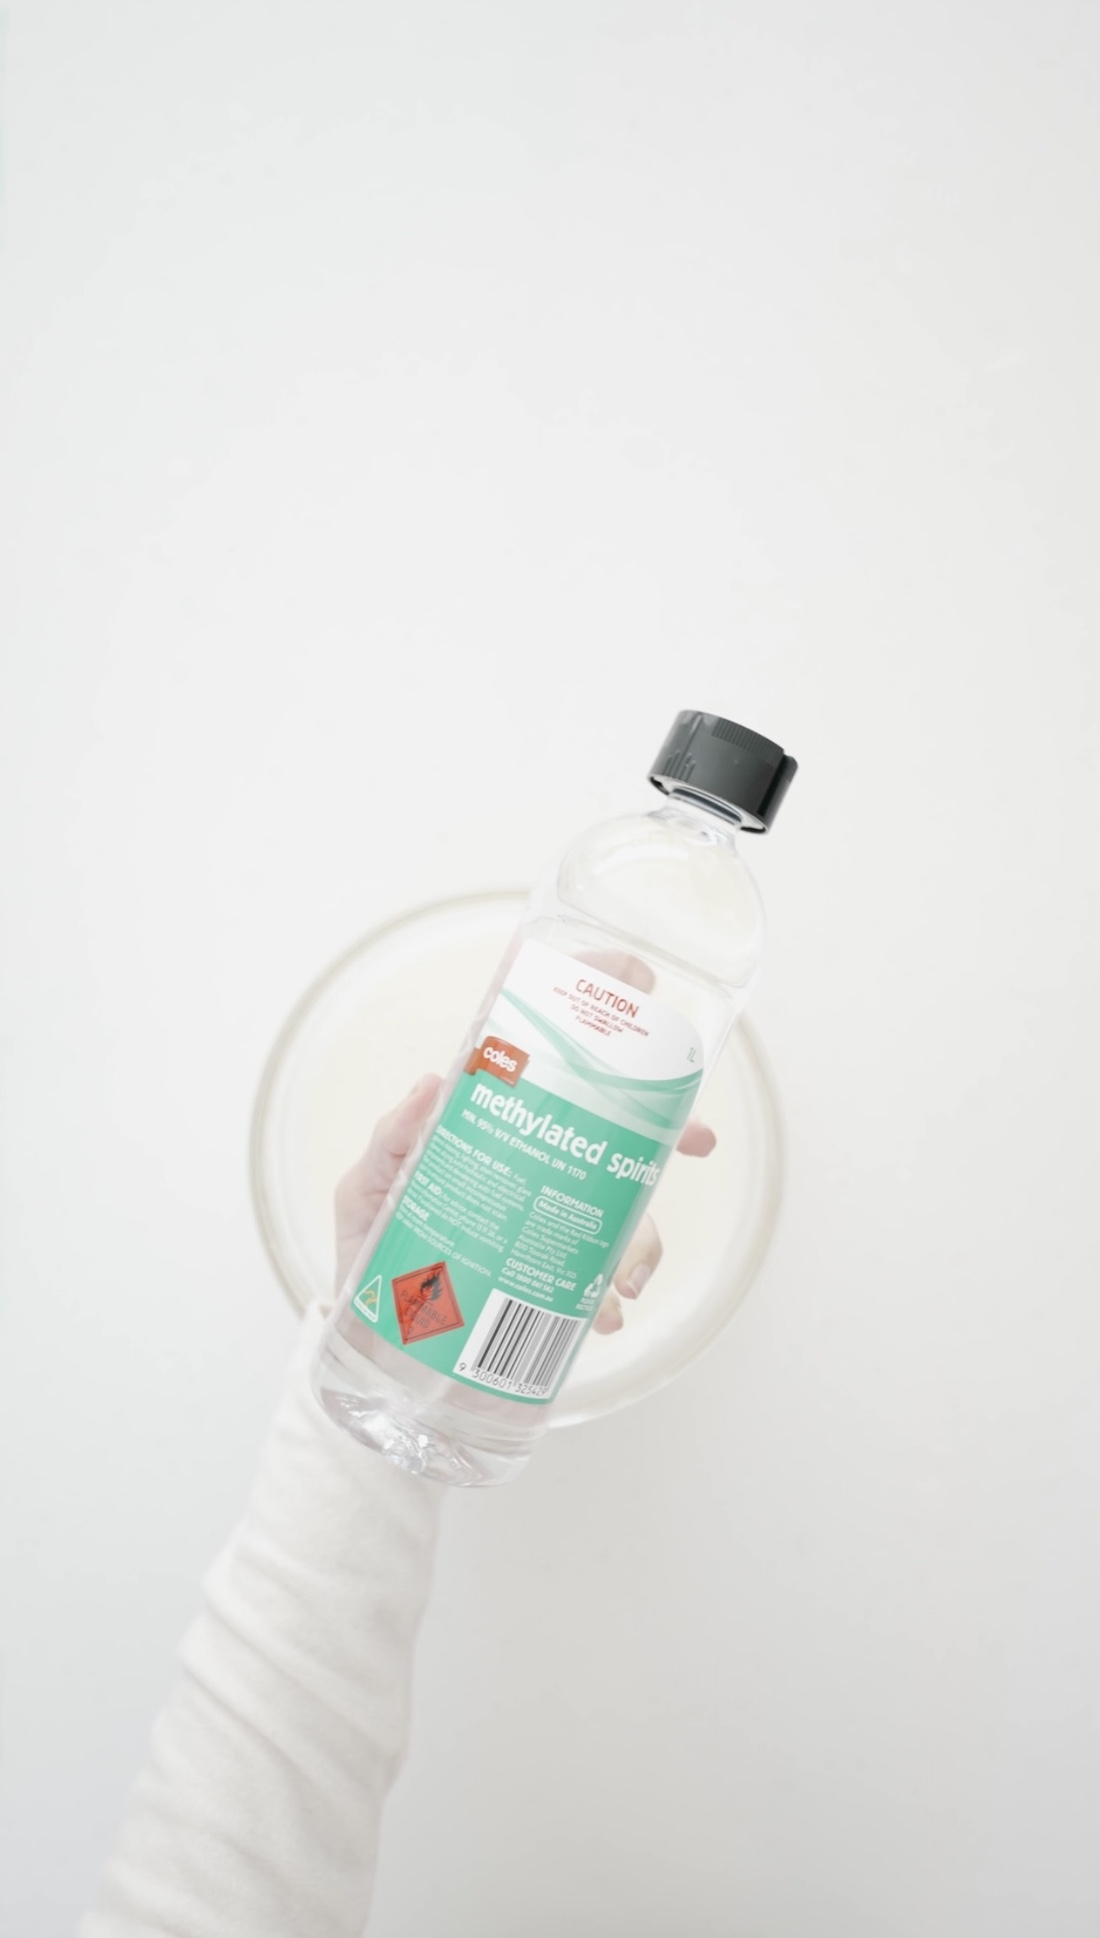 Add Methylated spirits